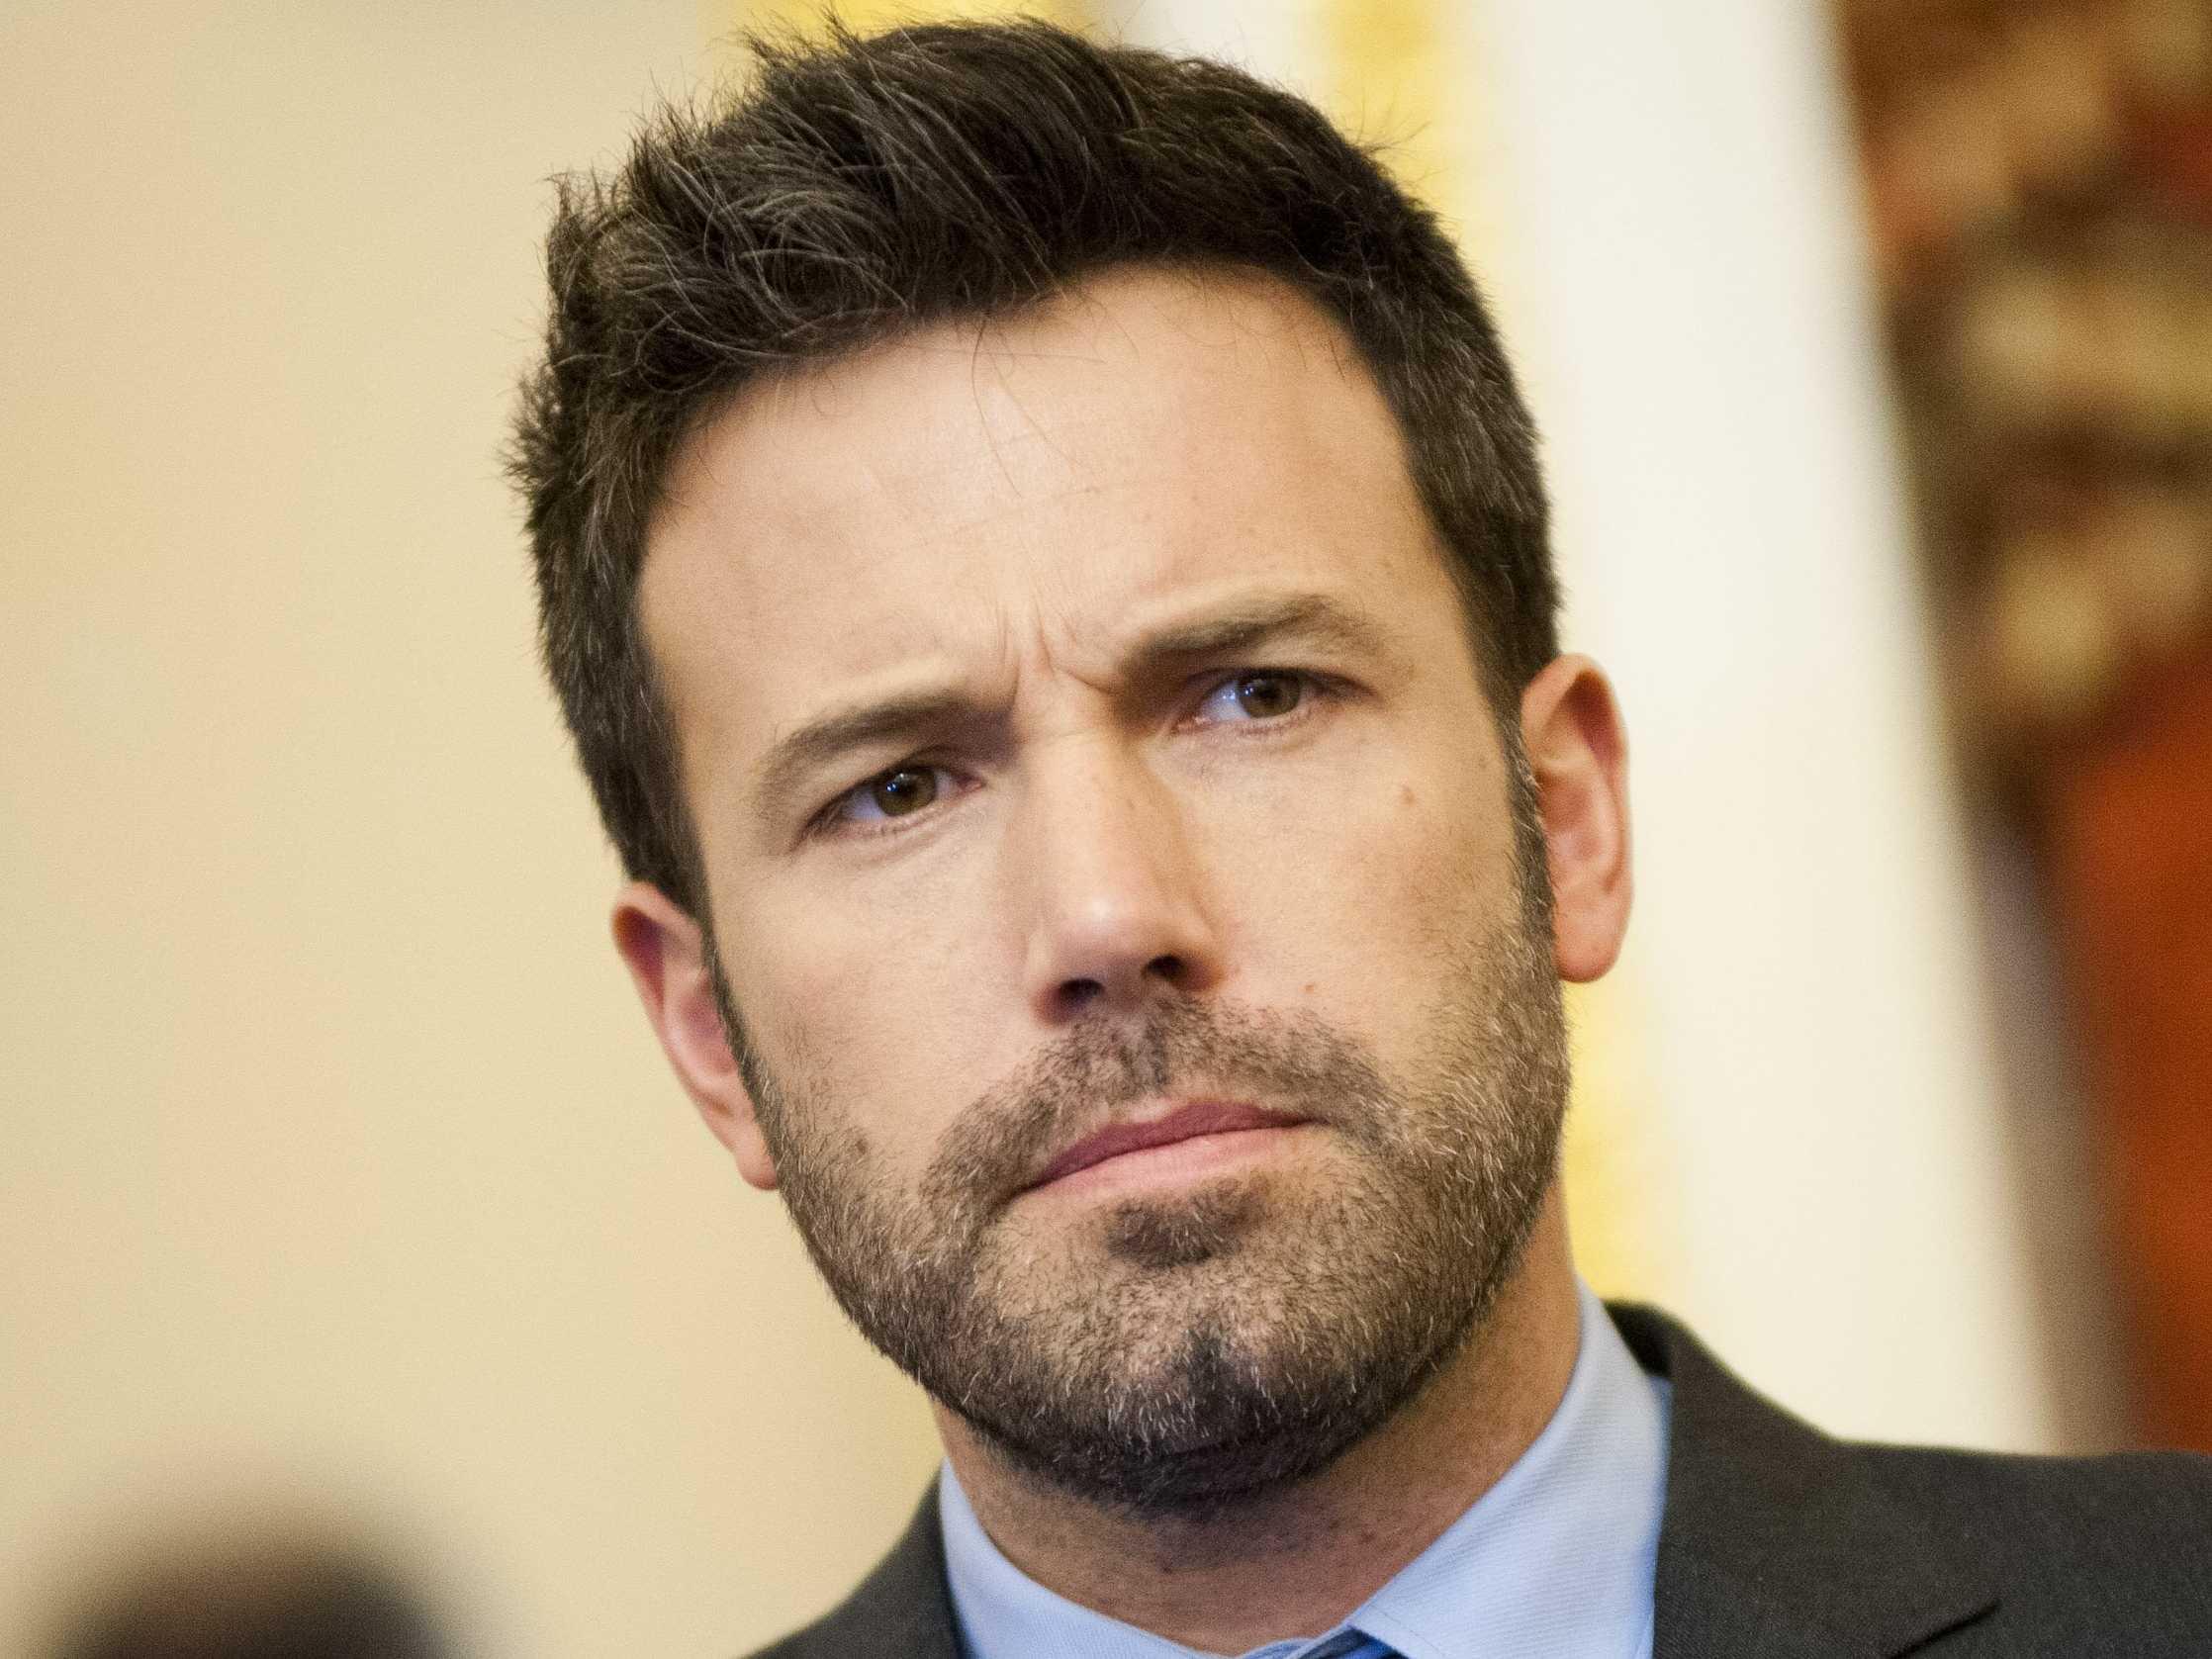 Lexus Joins In On Ben Affleck Batman Bashing On Twitter - Business